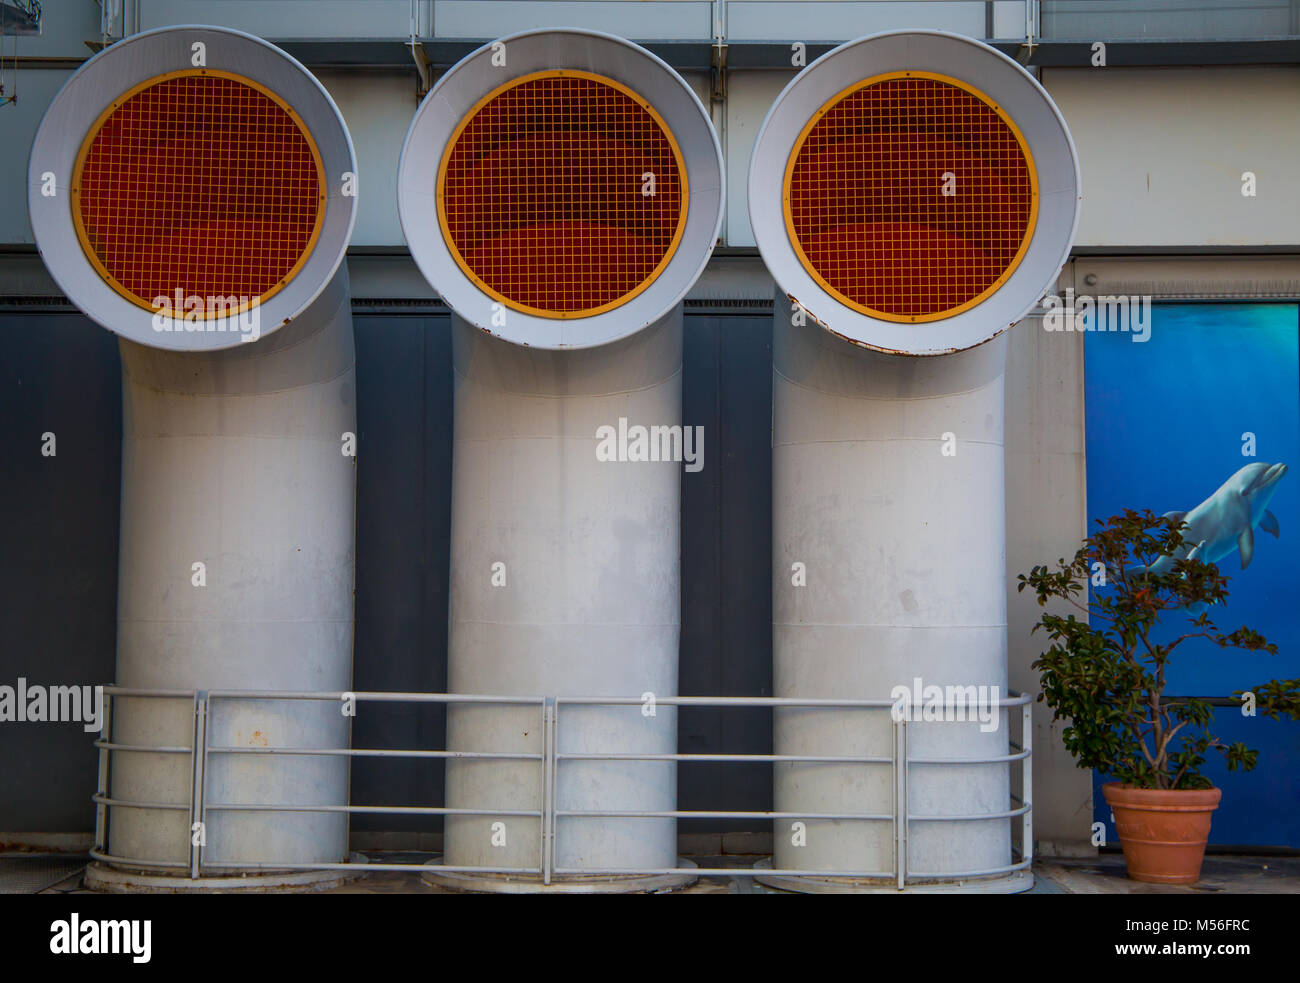 Vent Shaft Stock Photos & Vent Shaft Stock Images - Alamy